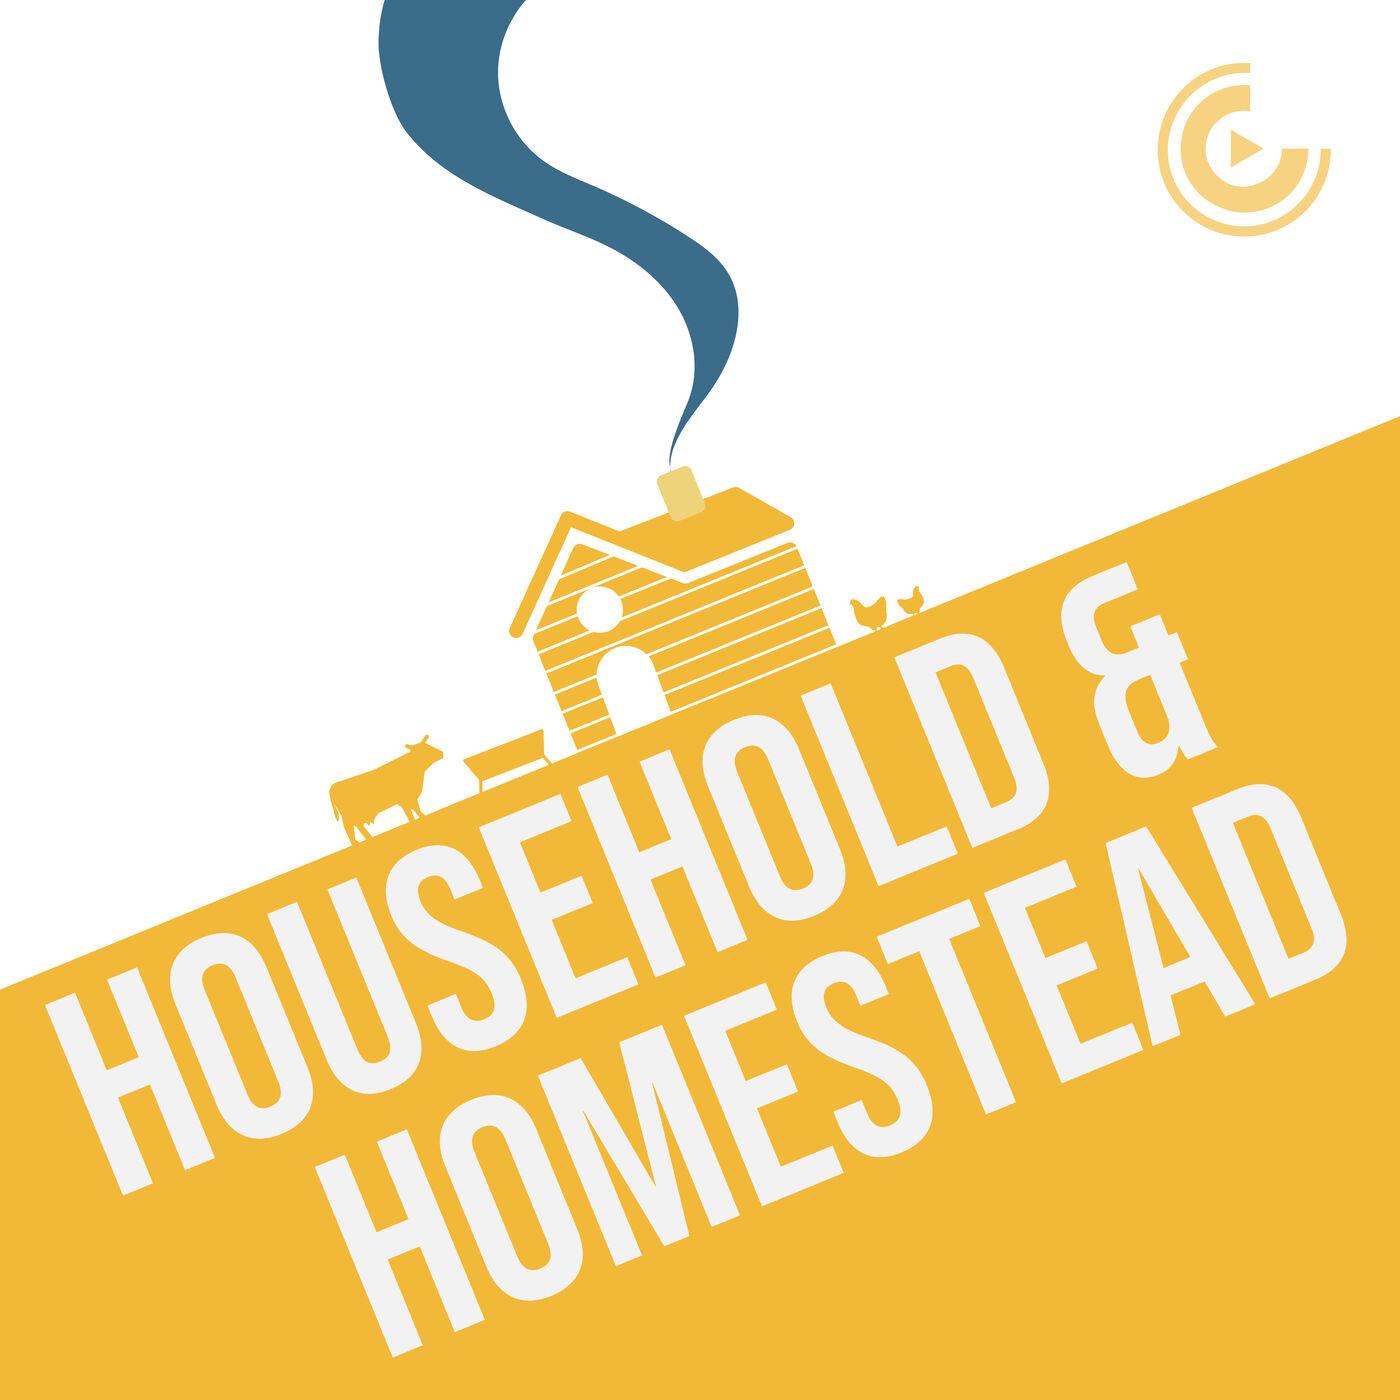 Household & Homestead | Episode 1